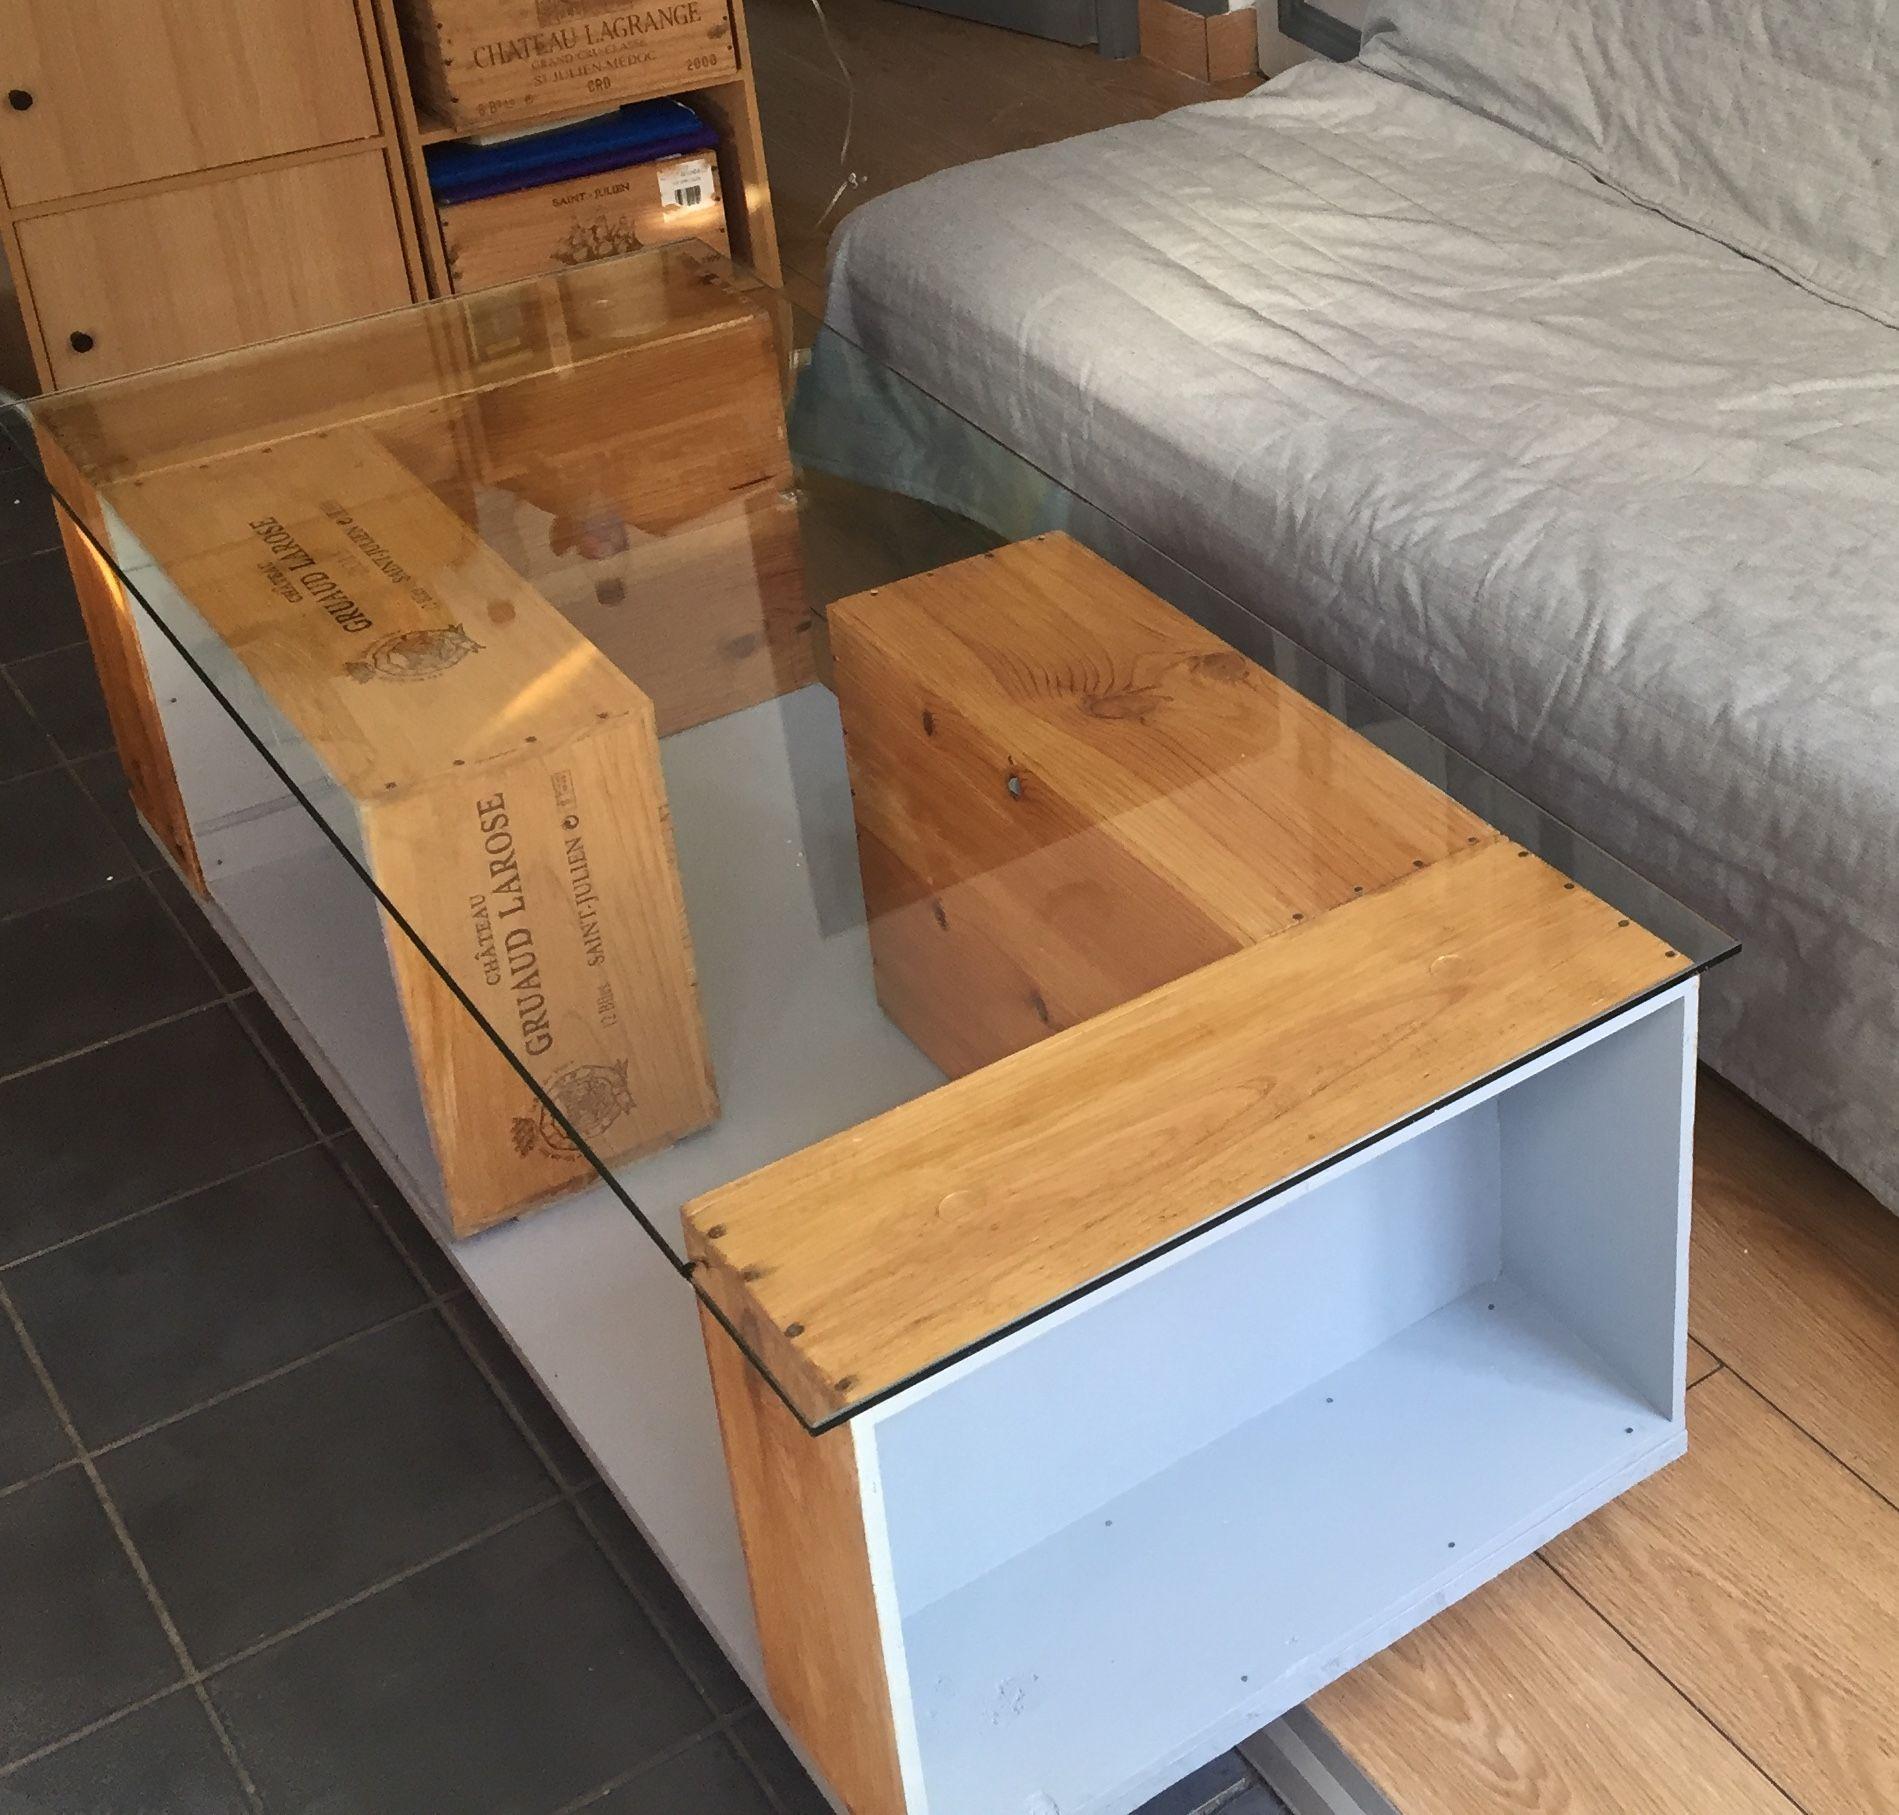 comment cr er une table basse en caisses vin caisse vin pinterest comment cr er. Black Bedroom Furniture Sets. Home Design Ideas